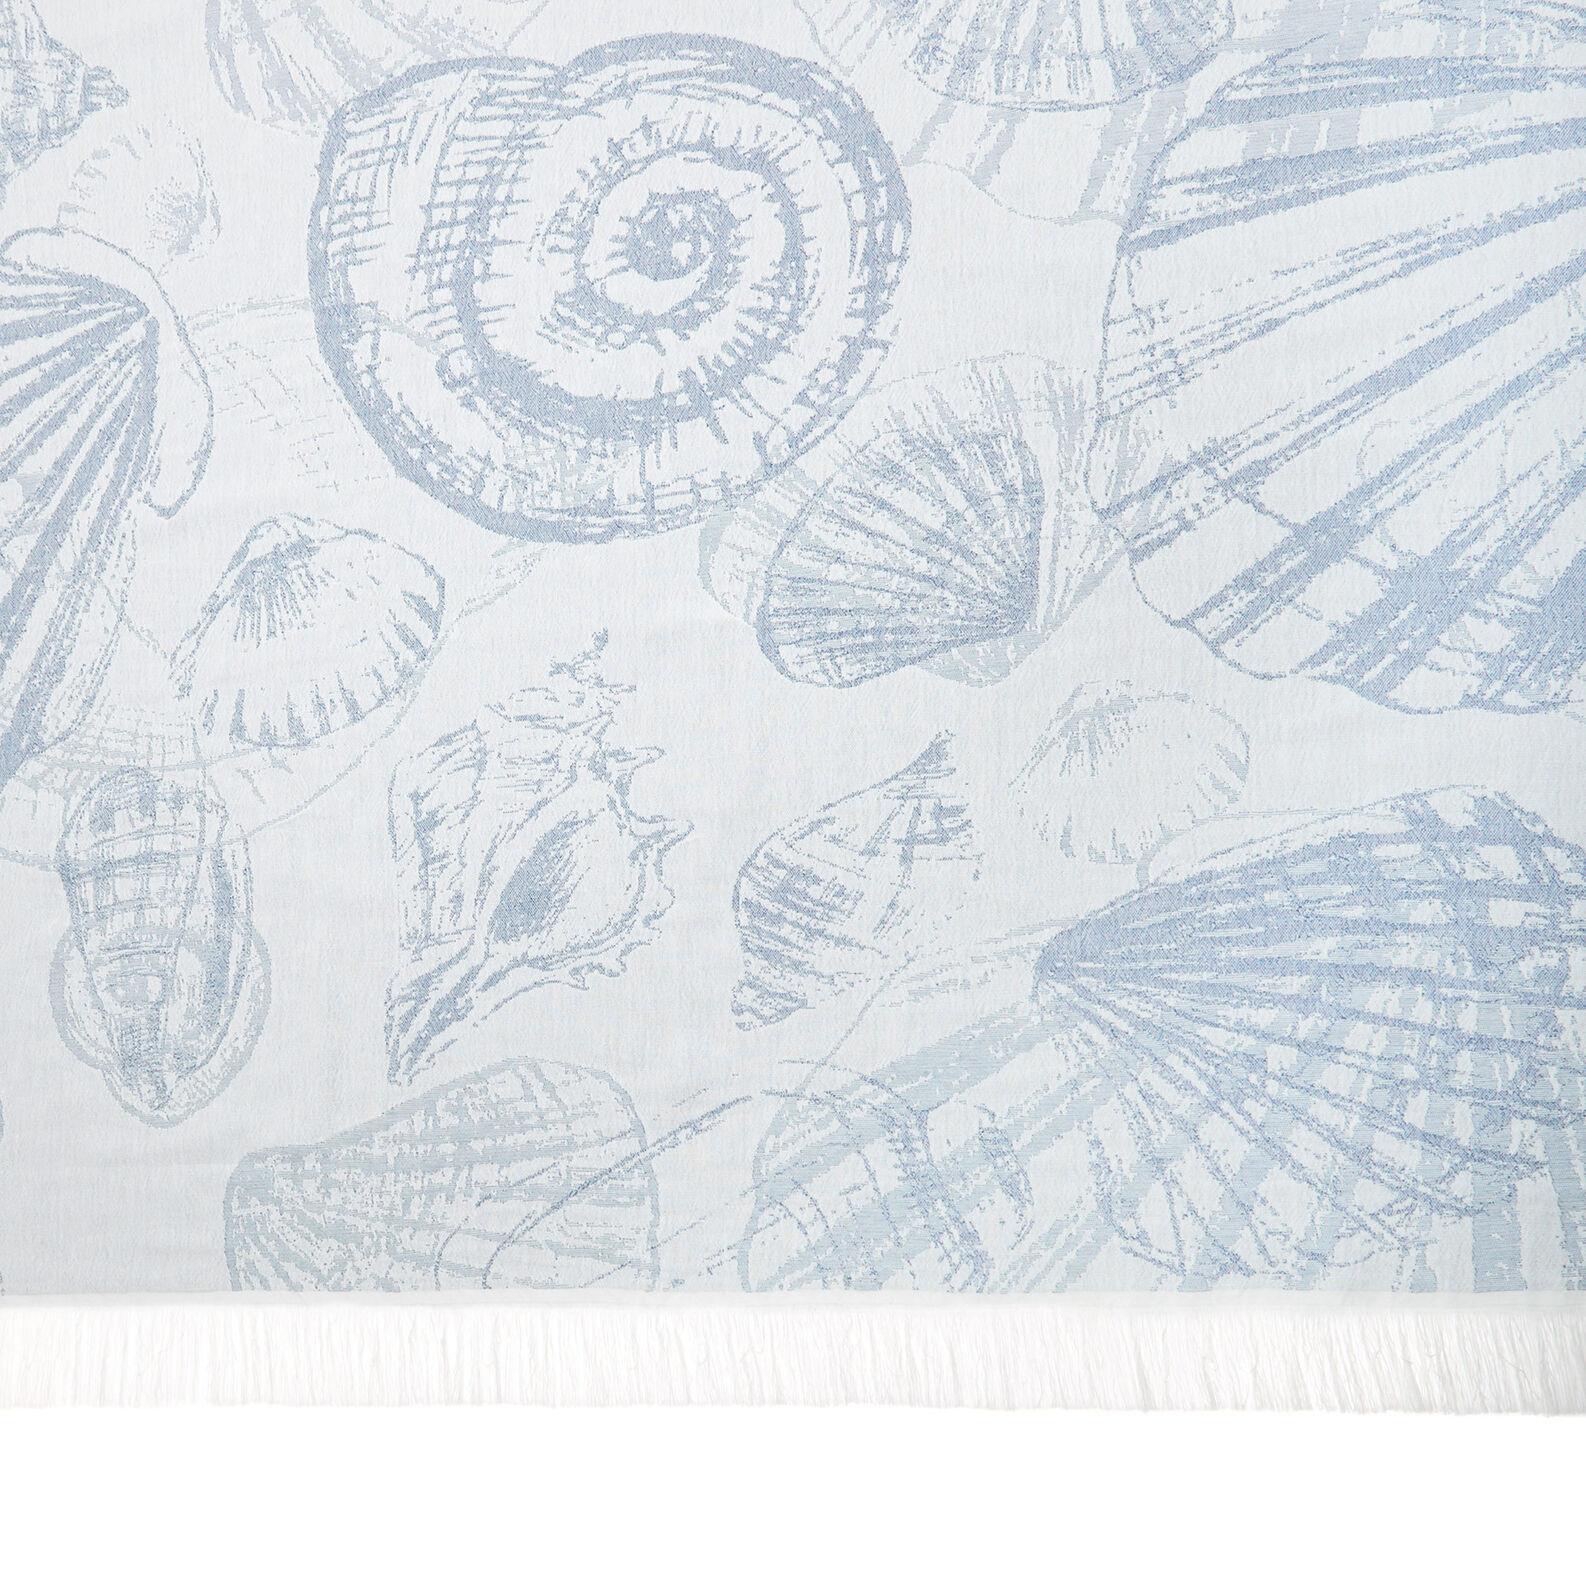 Cotton jacquard beach towel and sarong with shell design